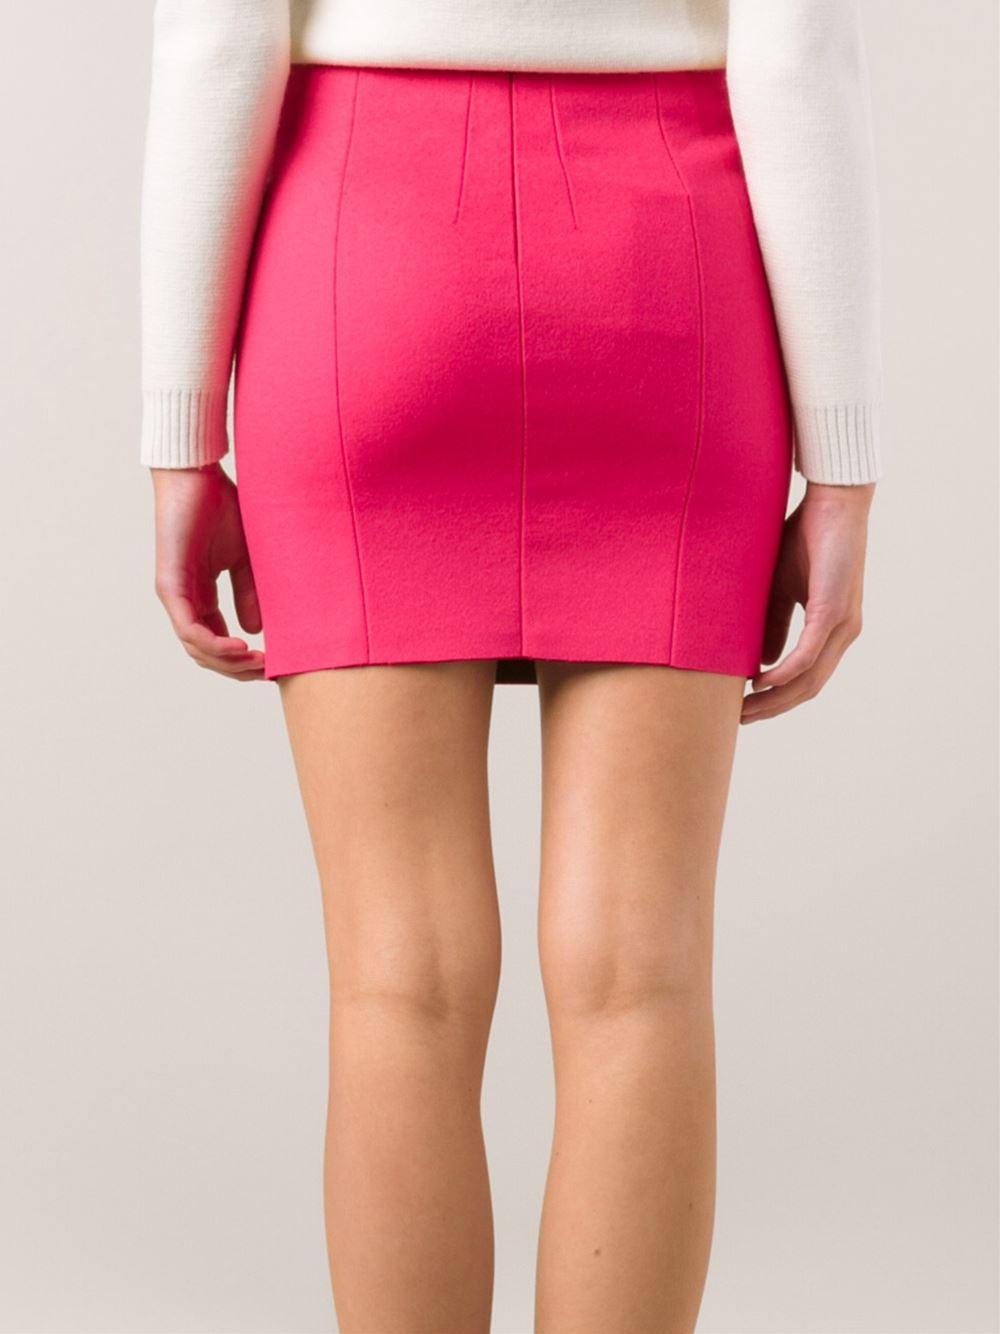 Pink mini skirt the